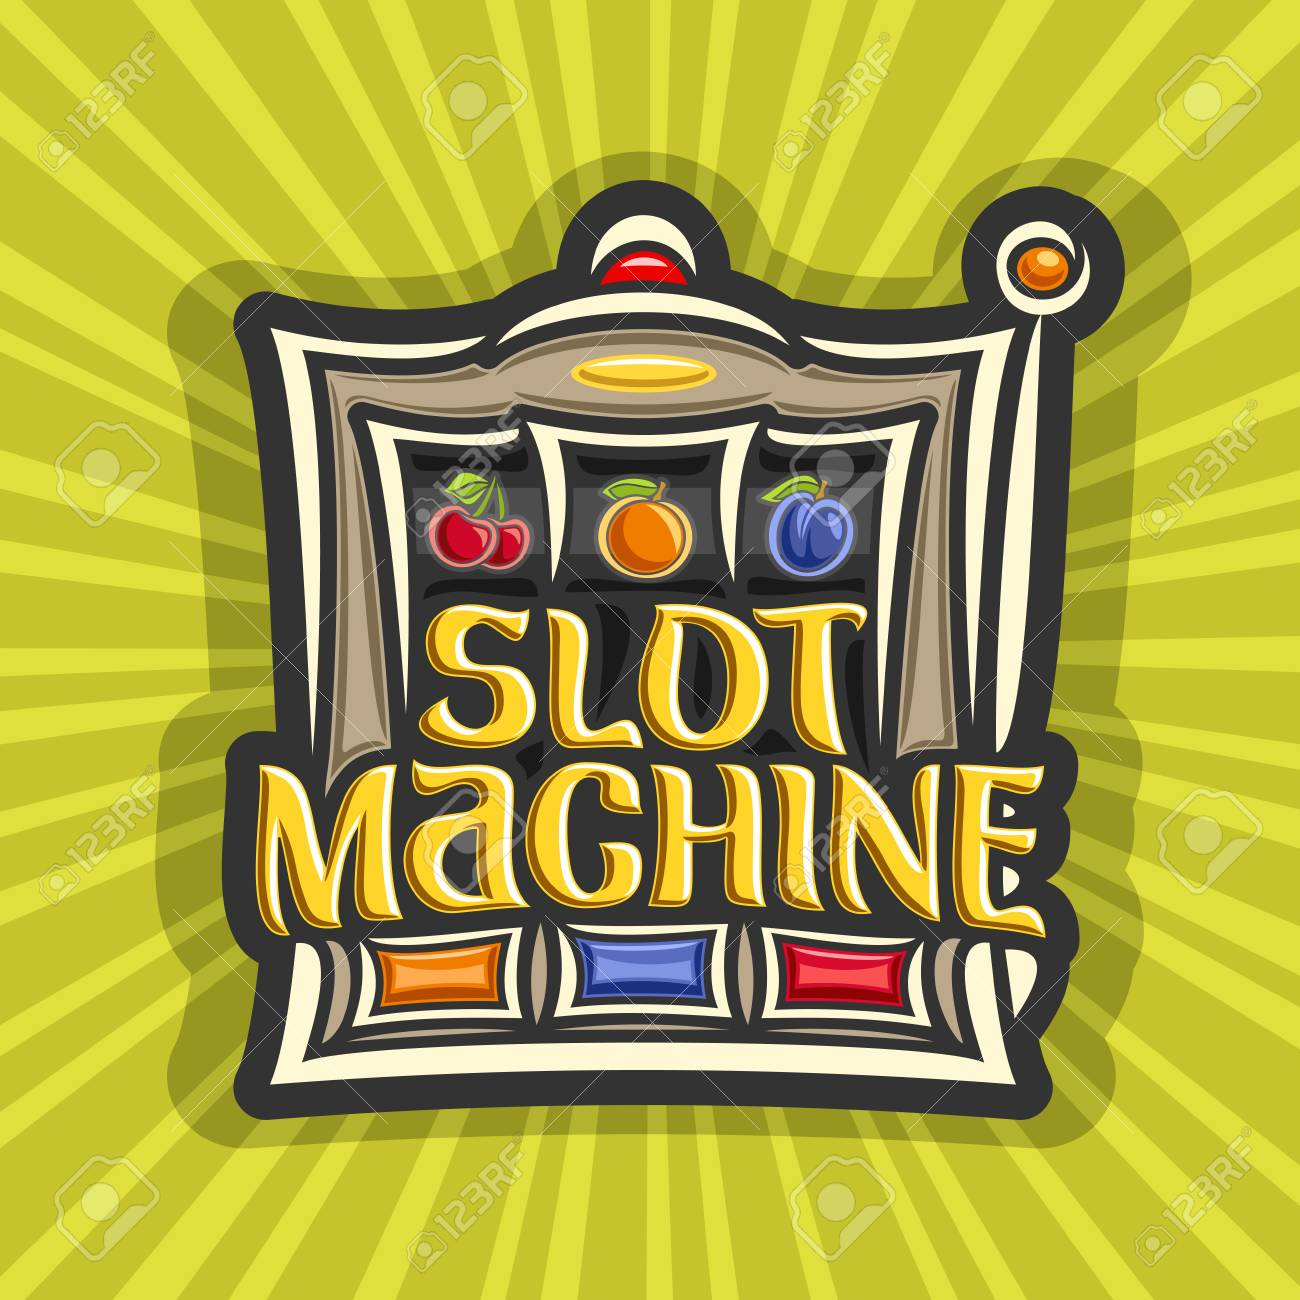 Slot machine titles lucky slots - free slot machines gratis